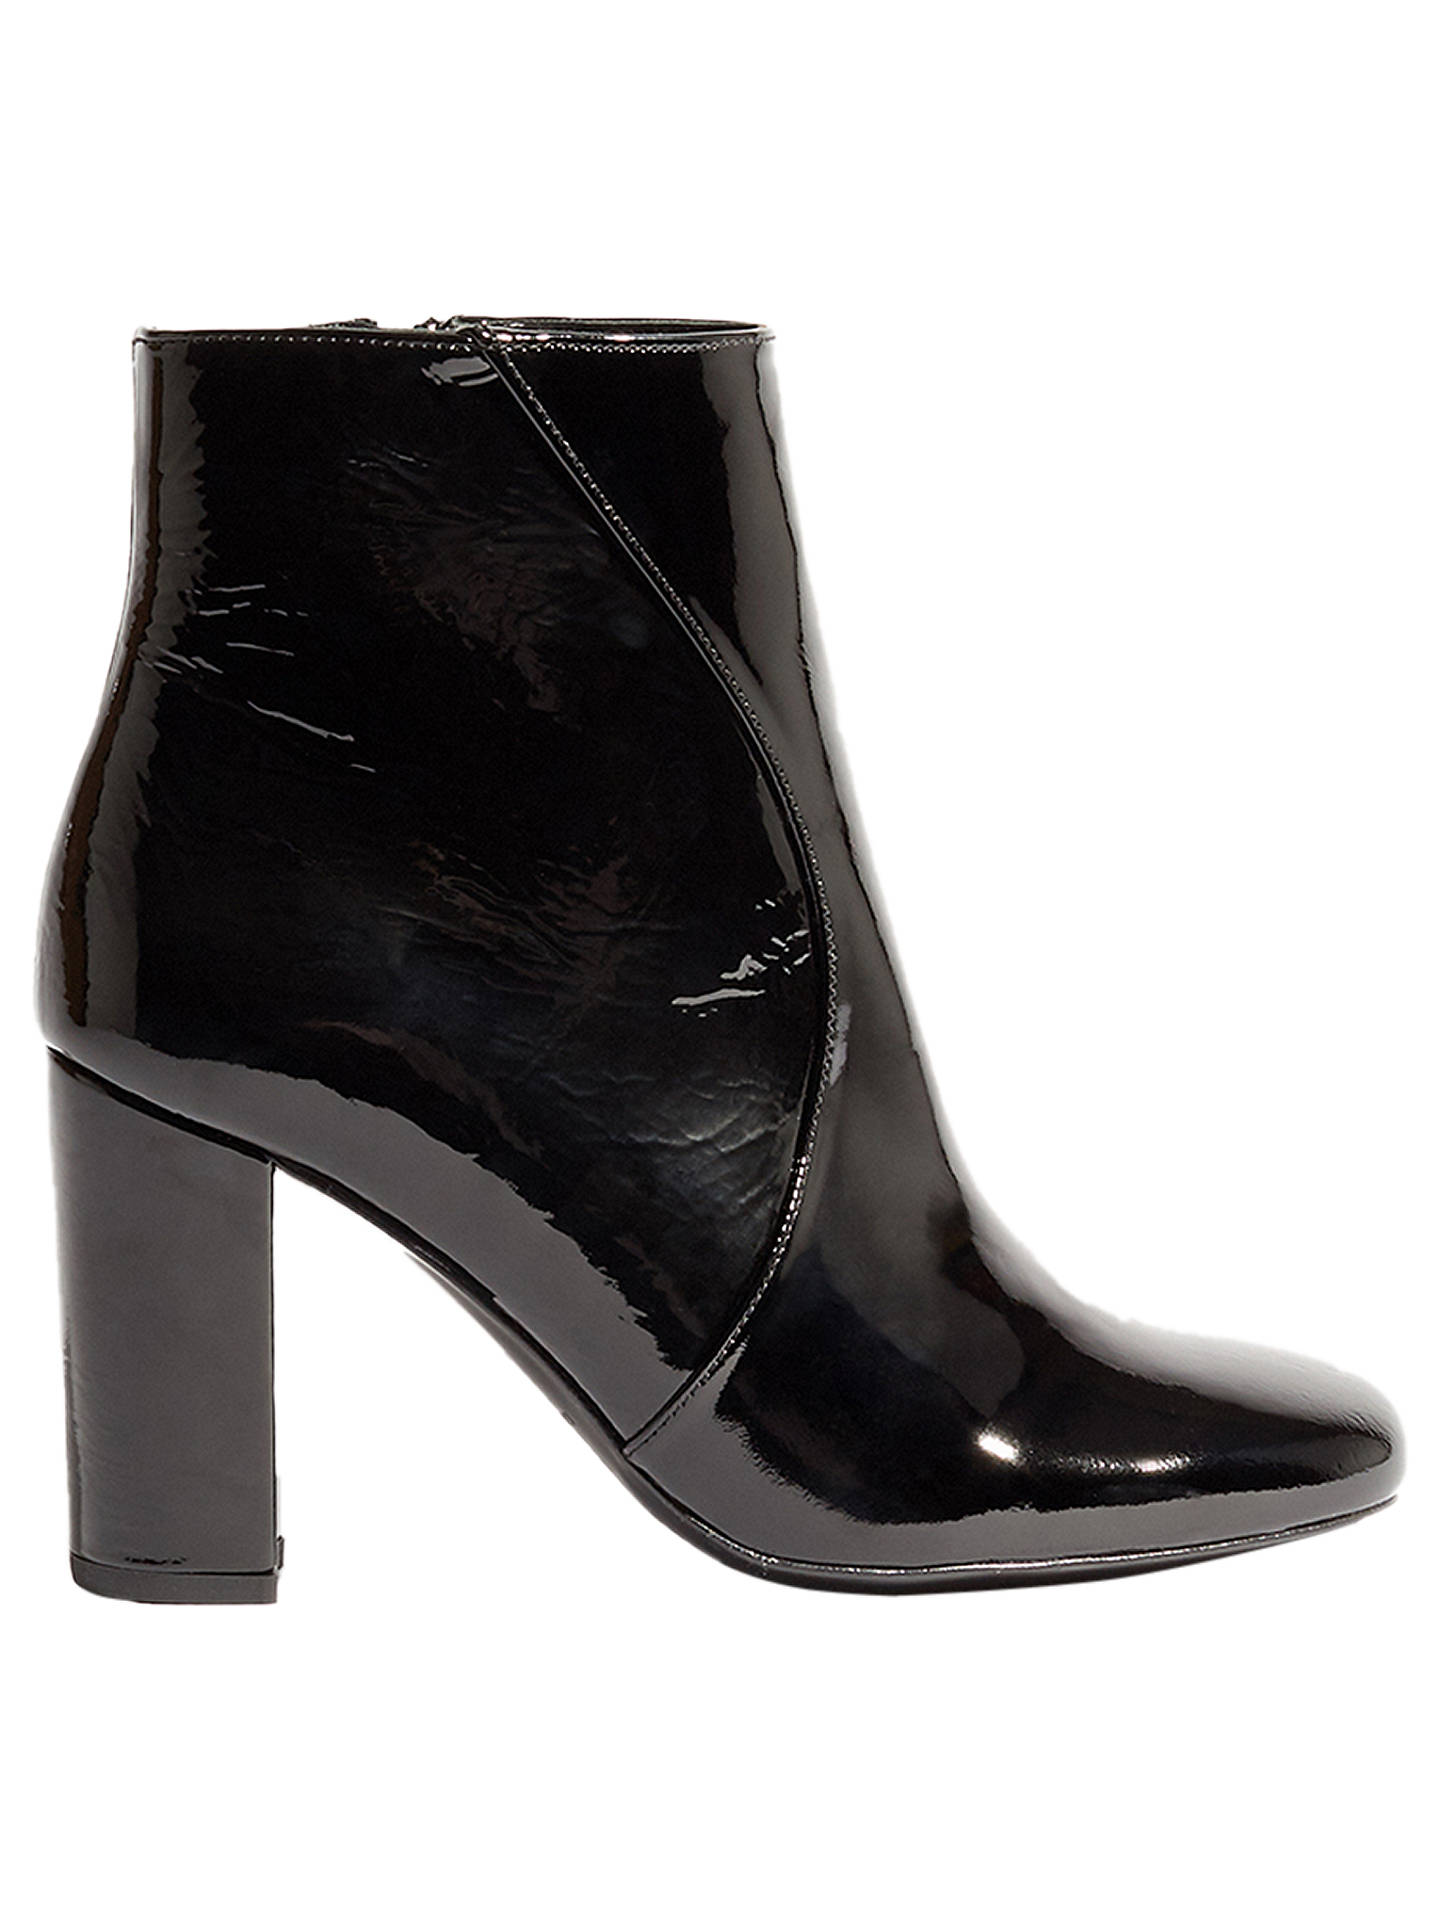 0d9ea47a68e Buy Karen Millen Patent Block Heel Ankle Boots, Black, 7 Online at  johnlewis.